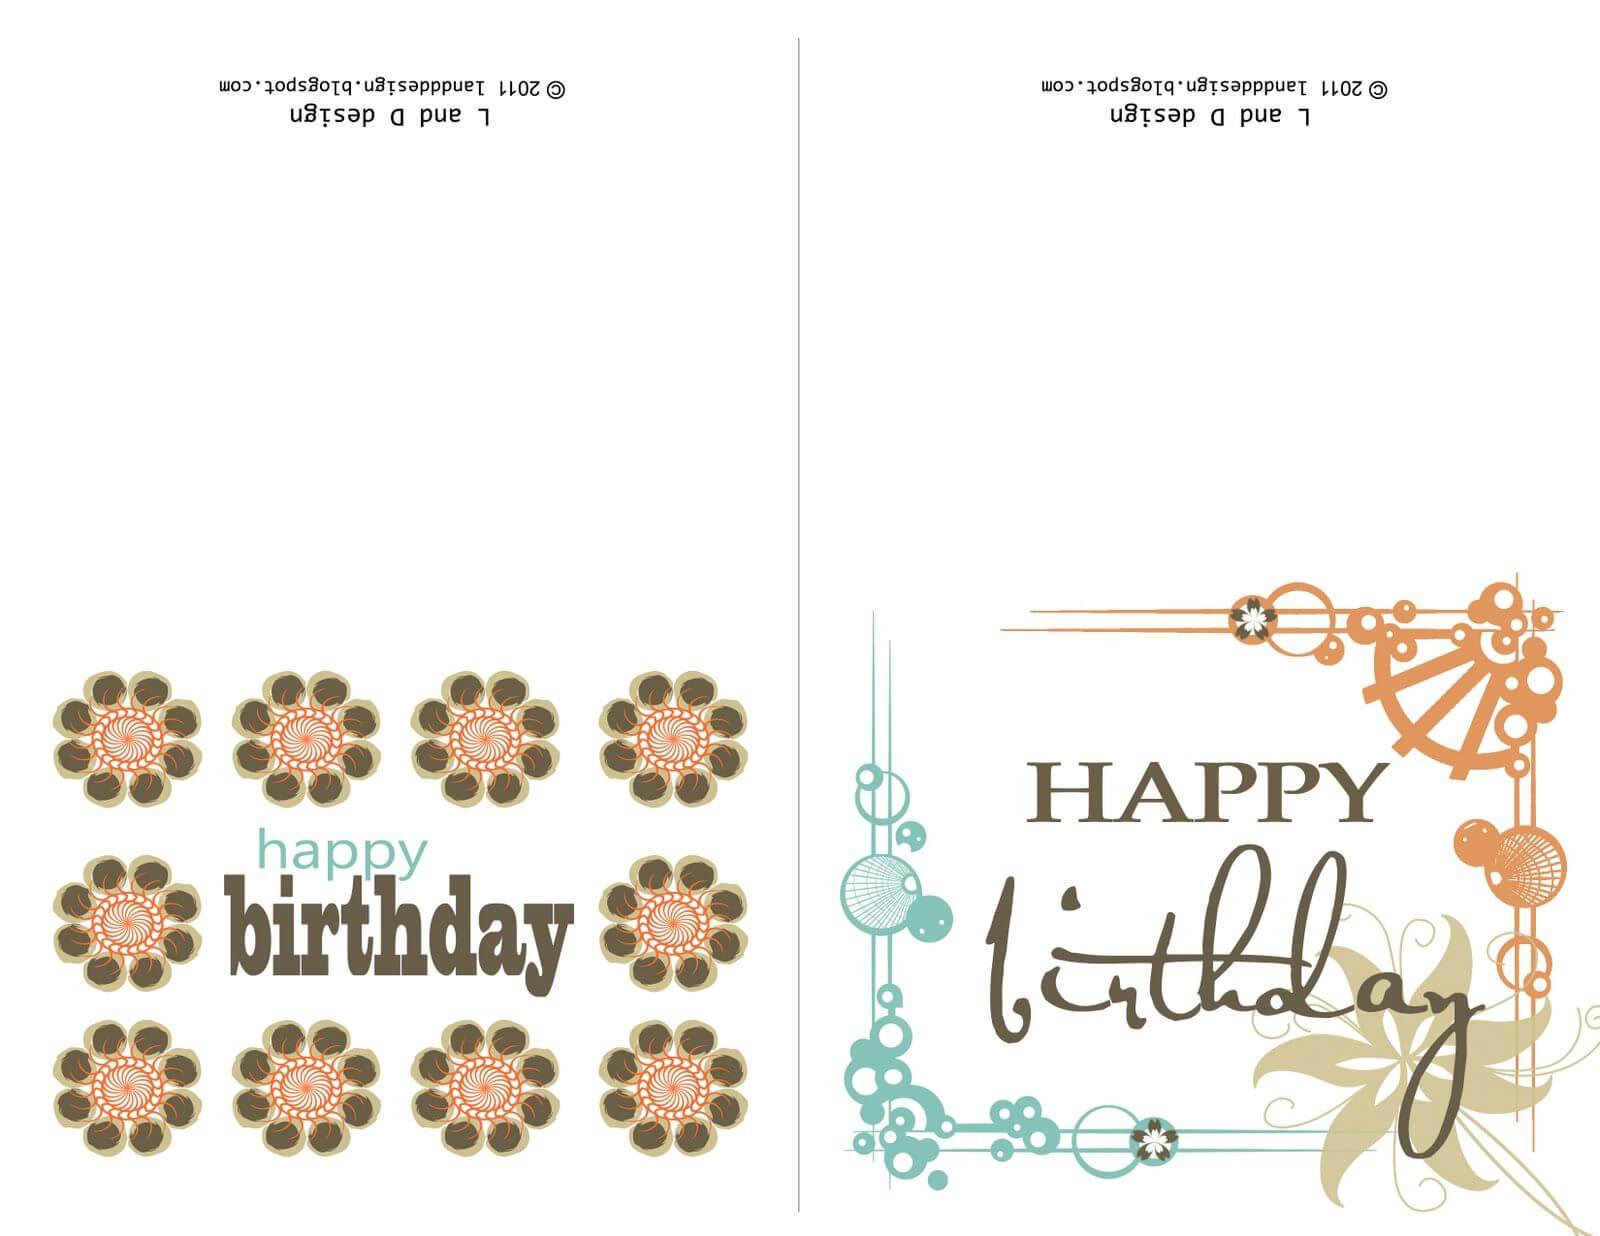 Printable Birthday Cards For Mom | Free Birthday Card With Regard To Mom Birthday Card Template